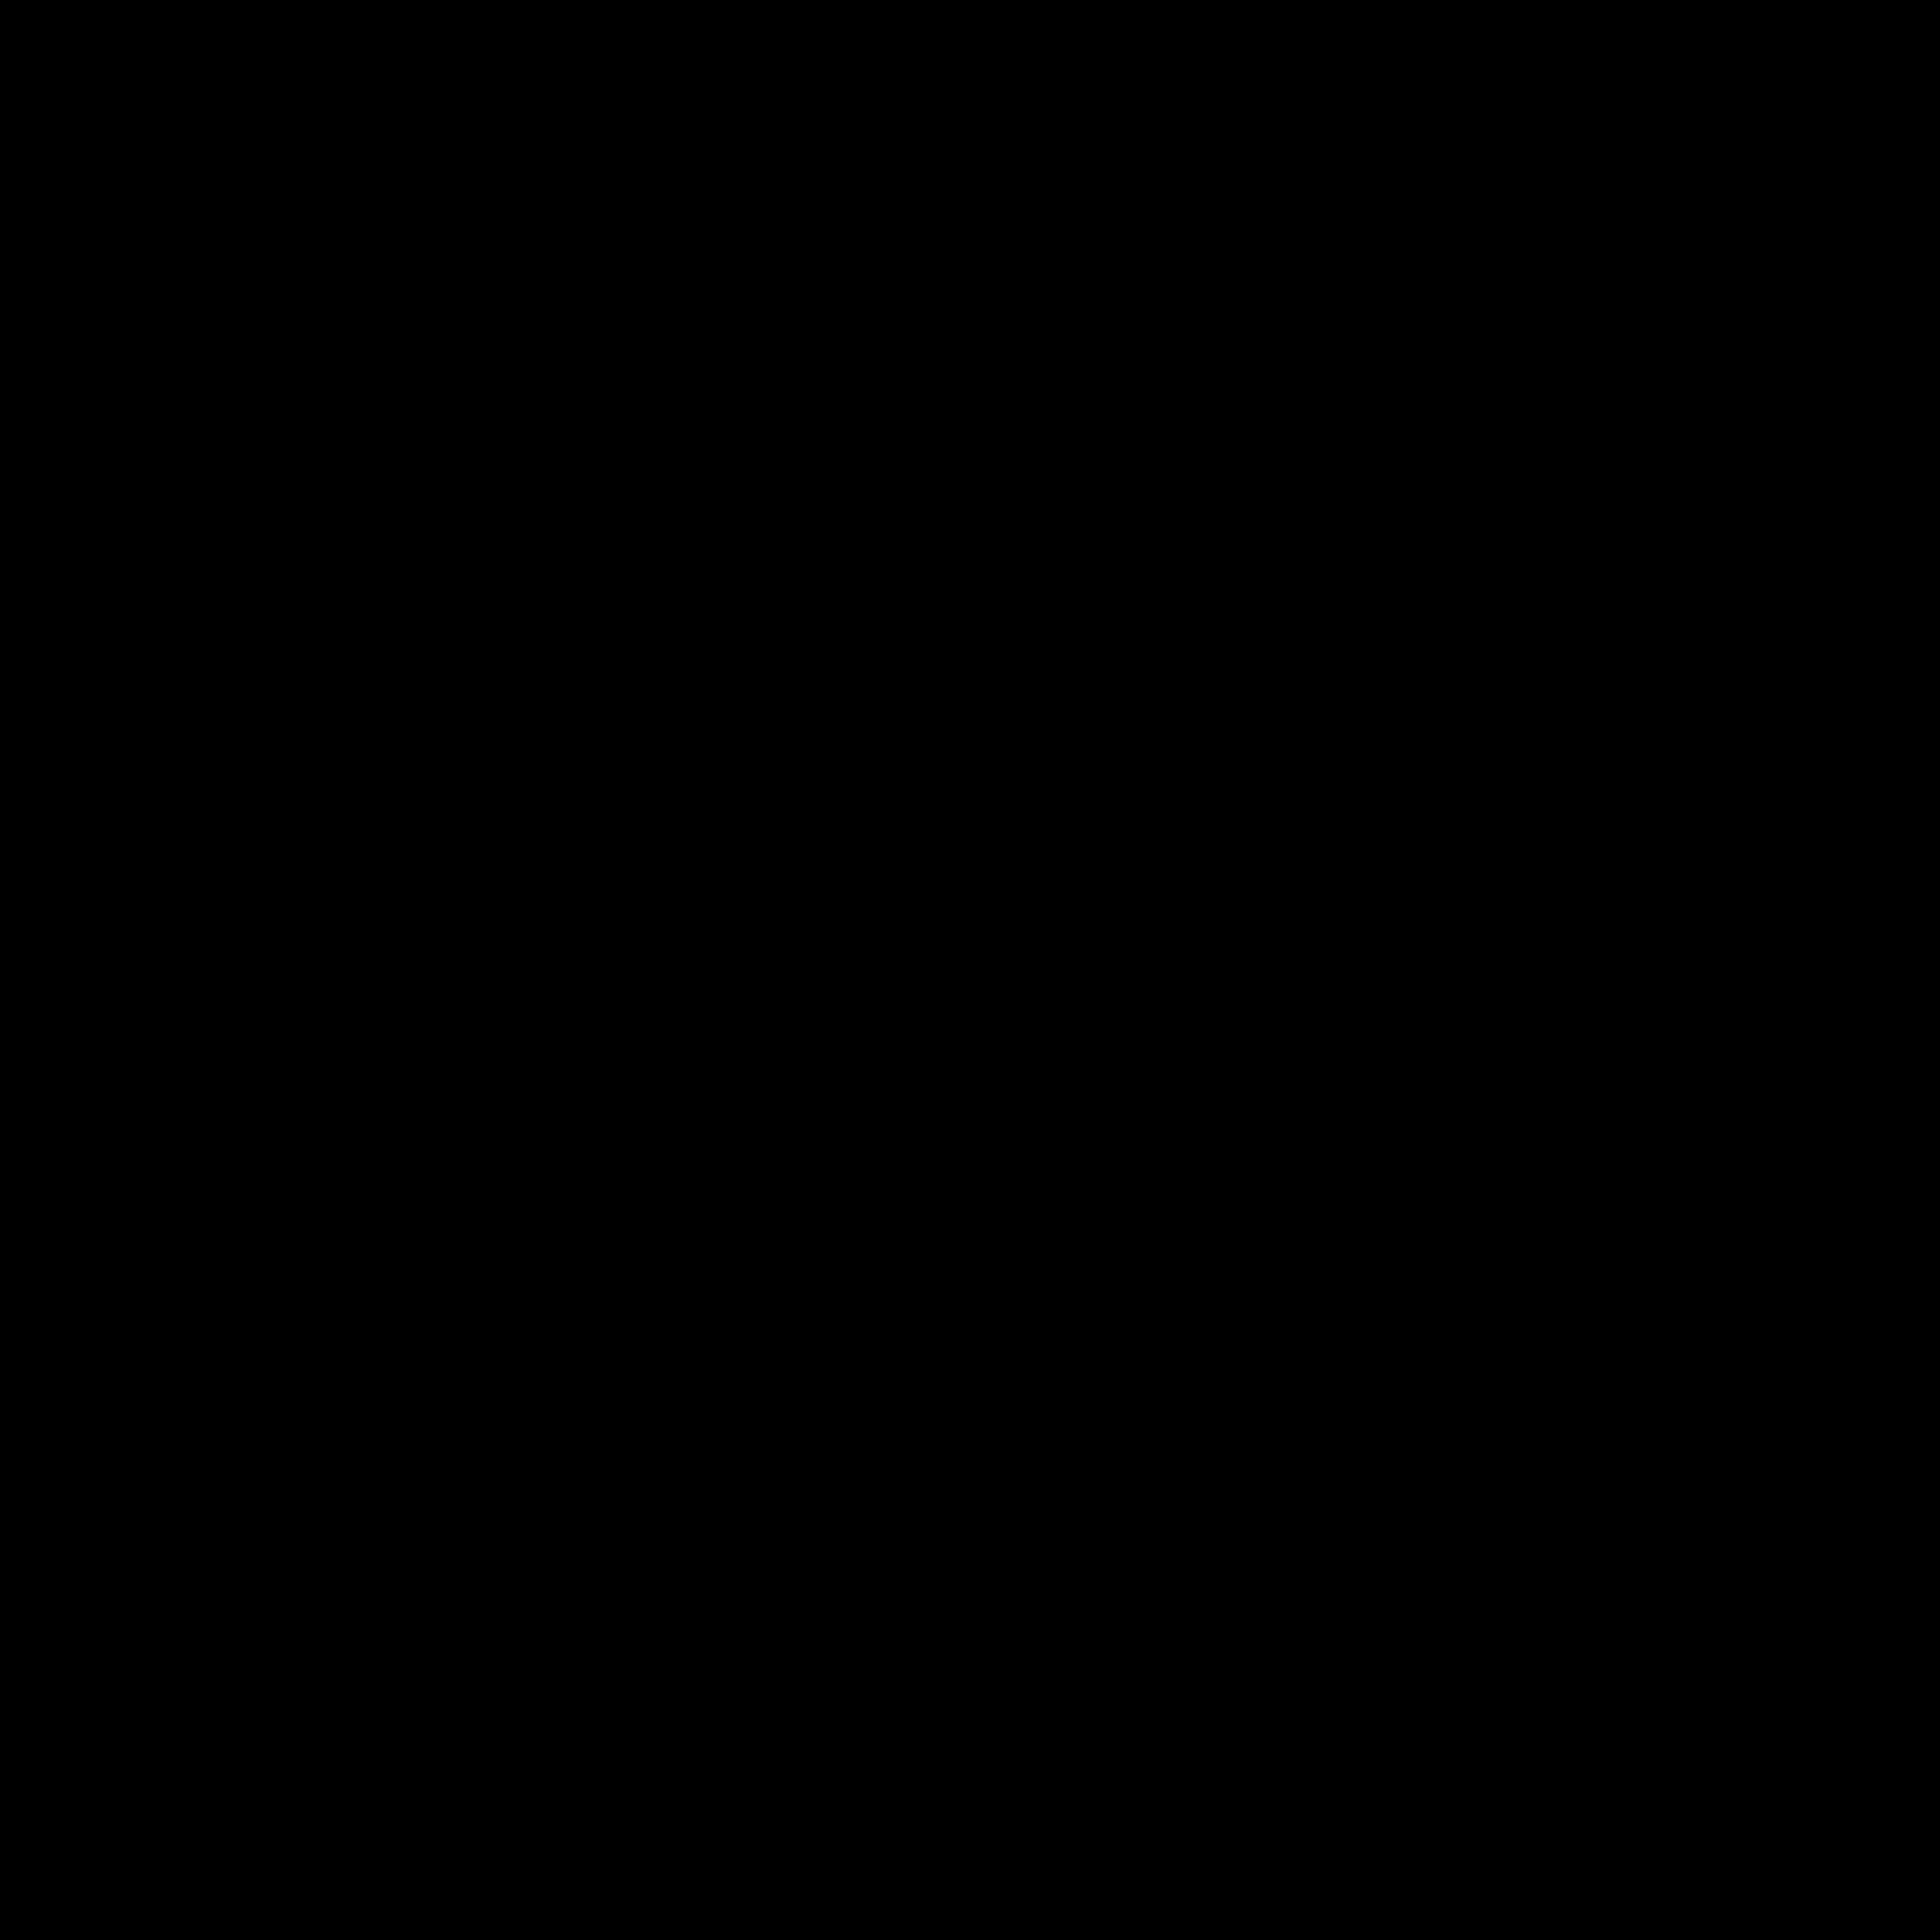 Black WWW Icon image #11202 - Www PNG